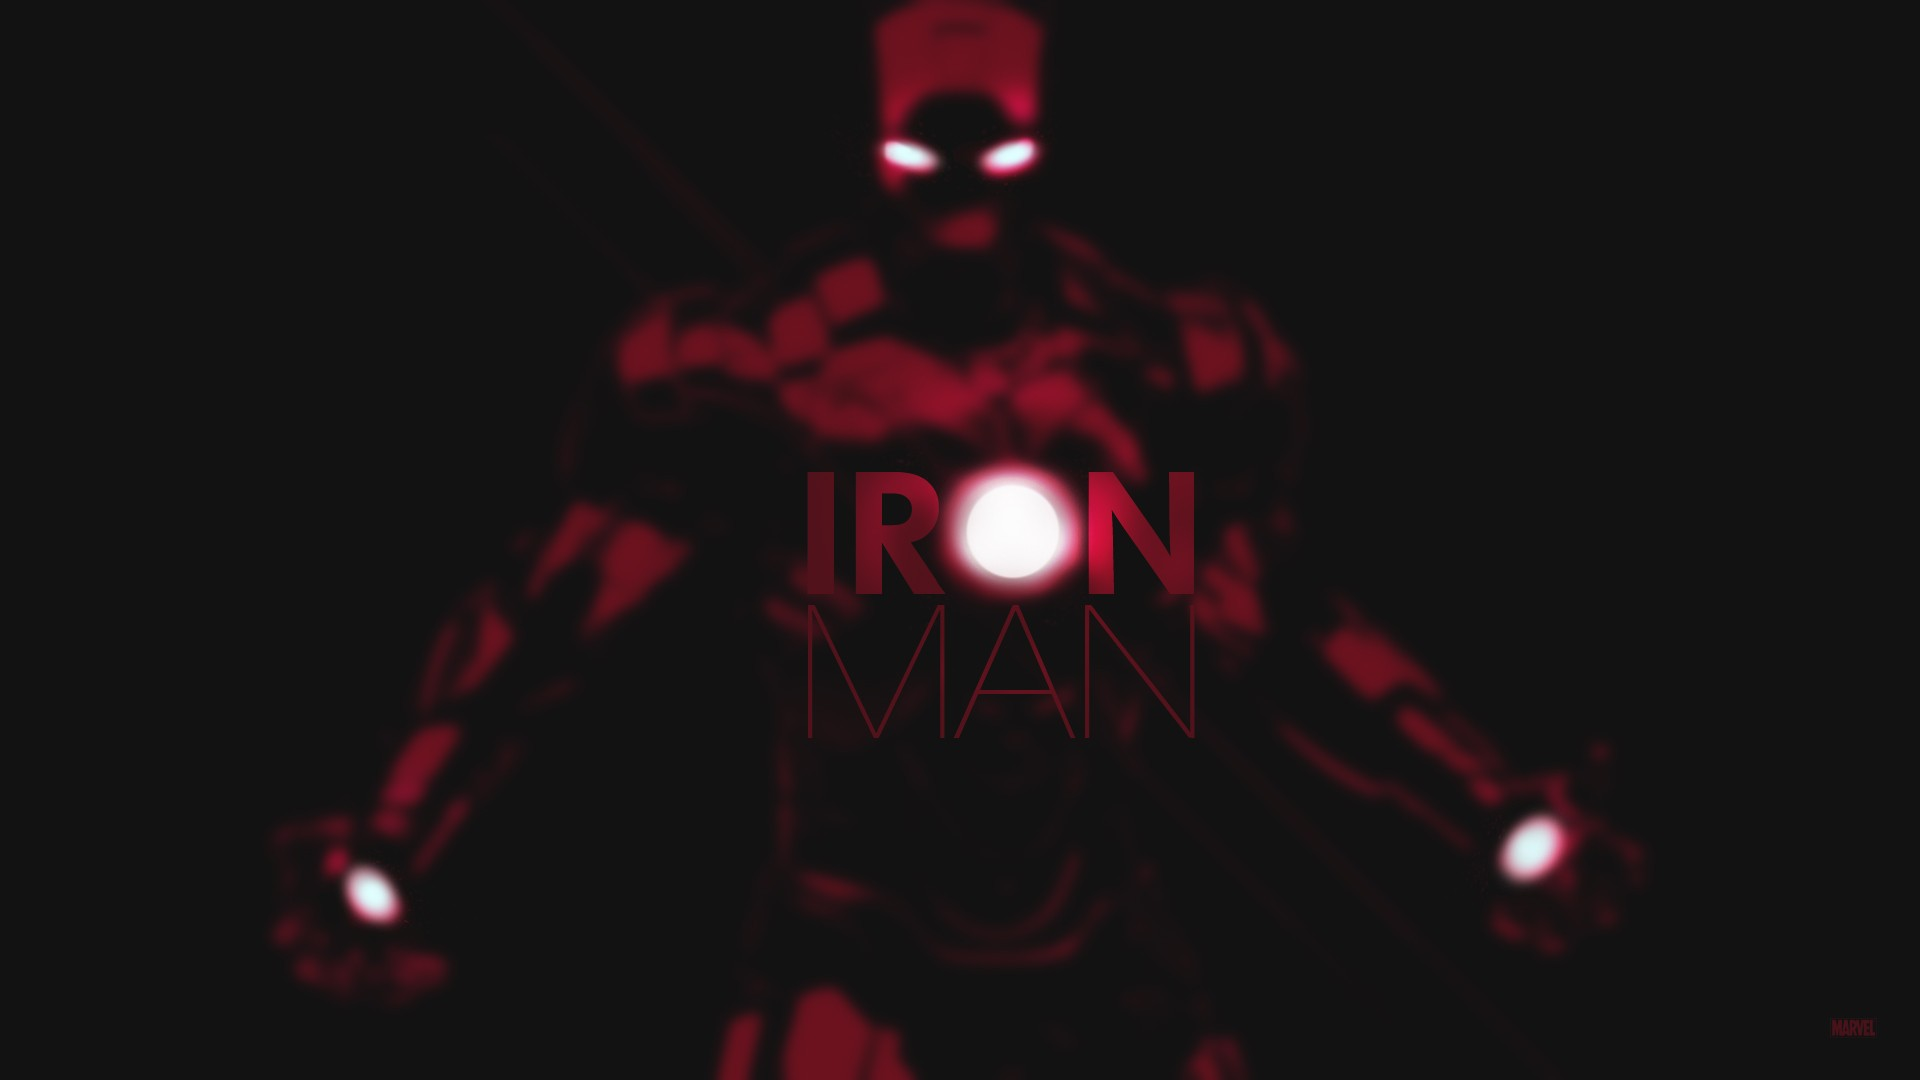 Iron Man Marvel Black Superhero Wallpaper